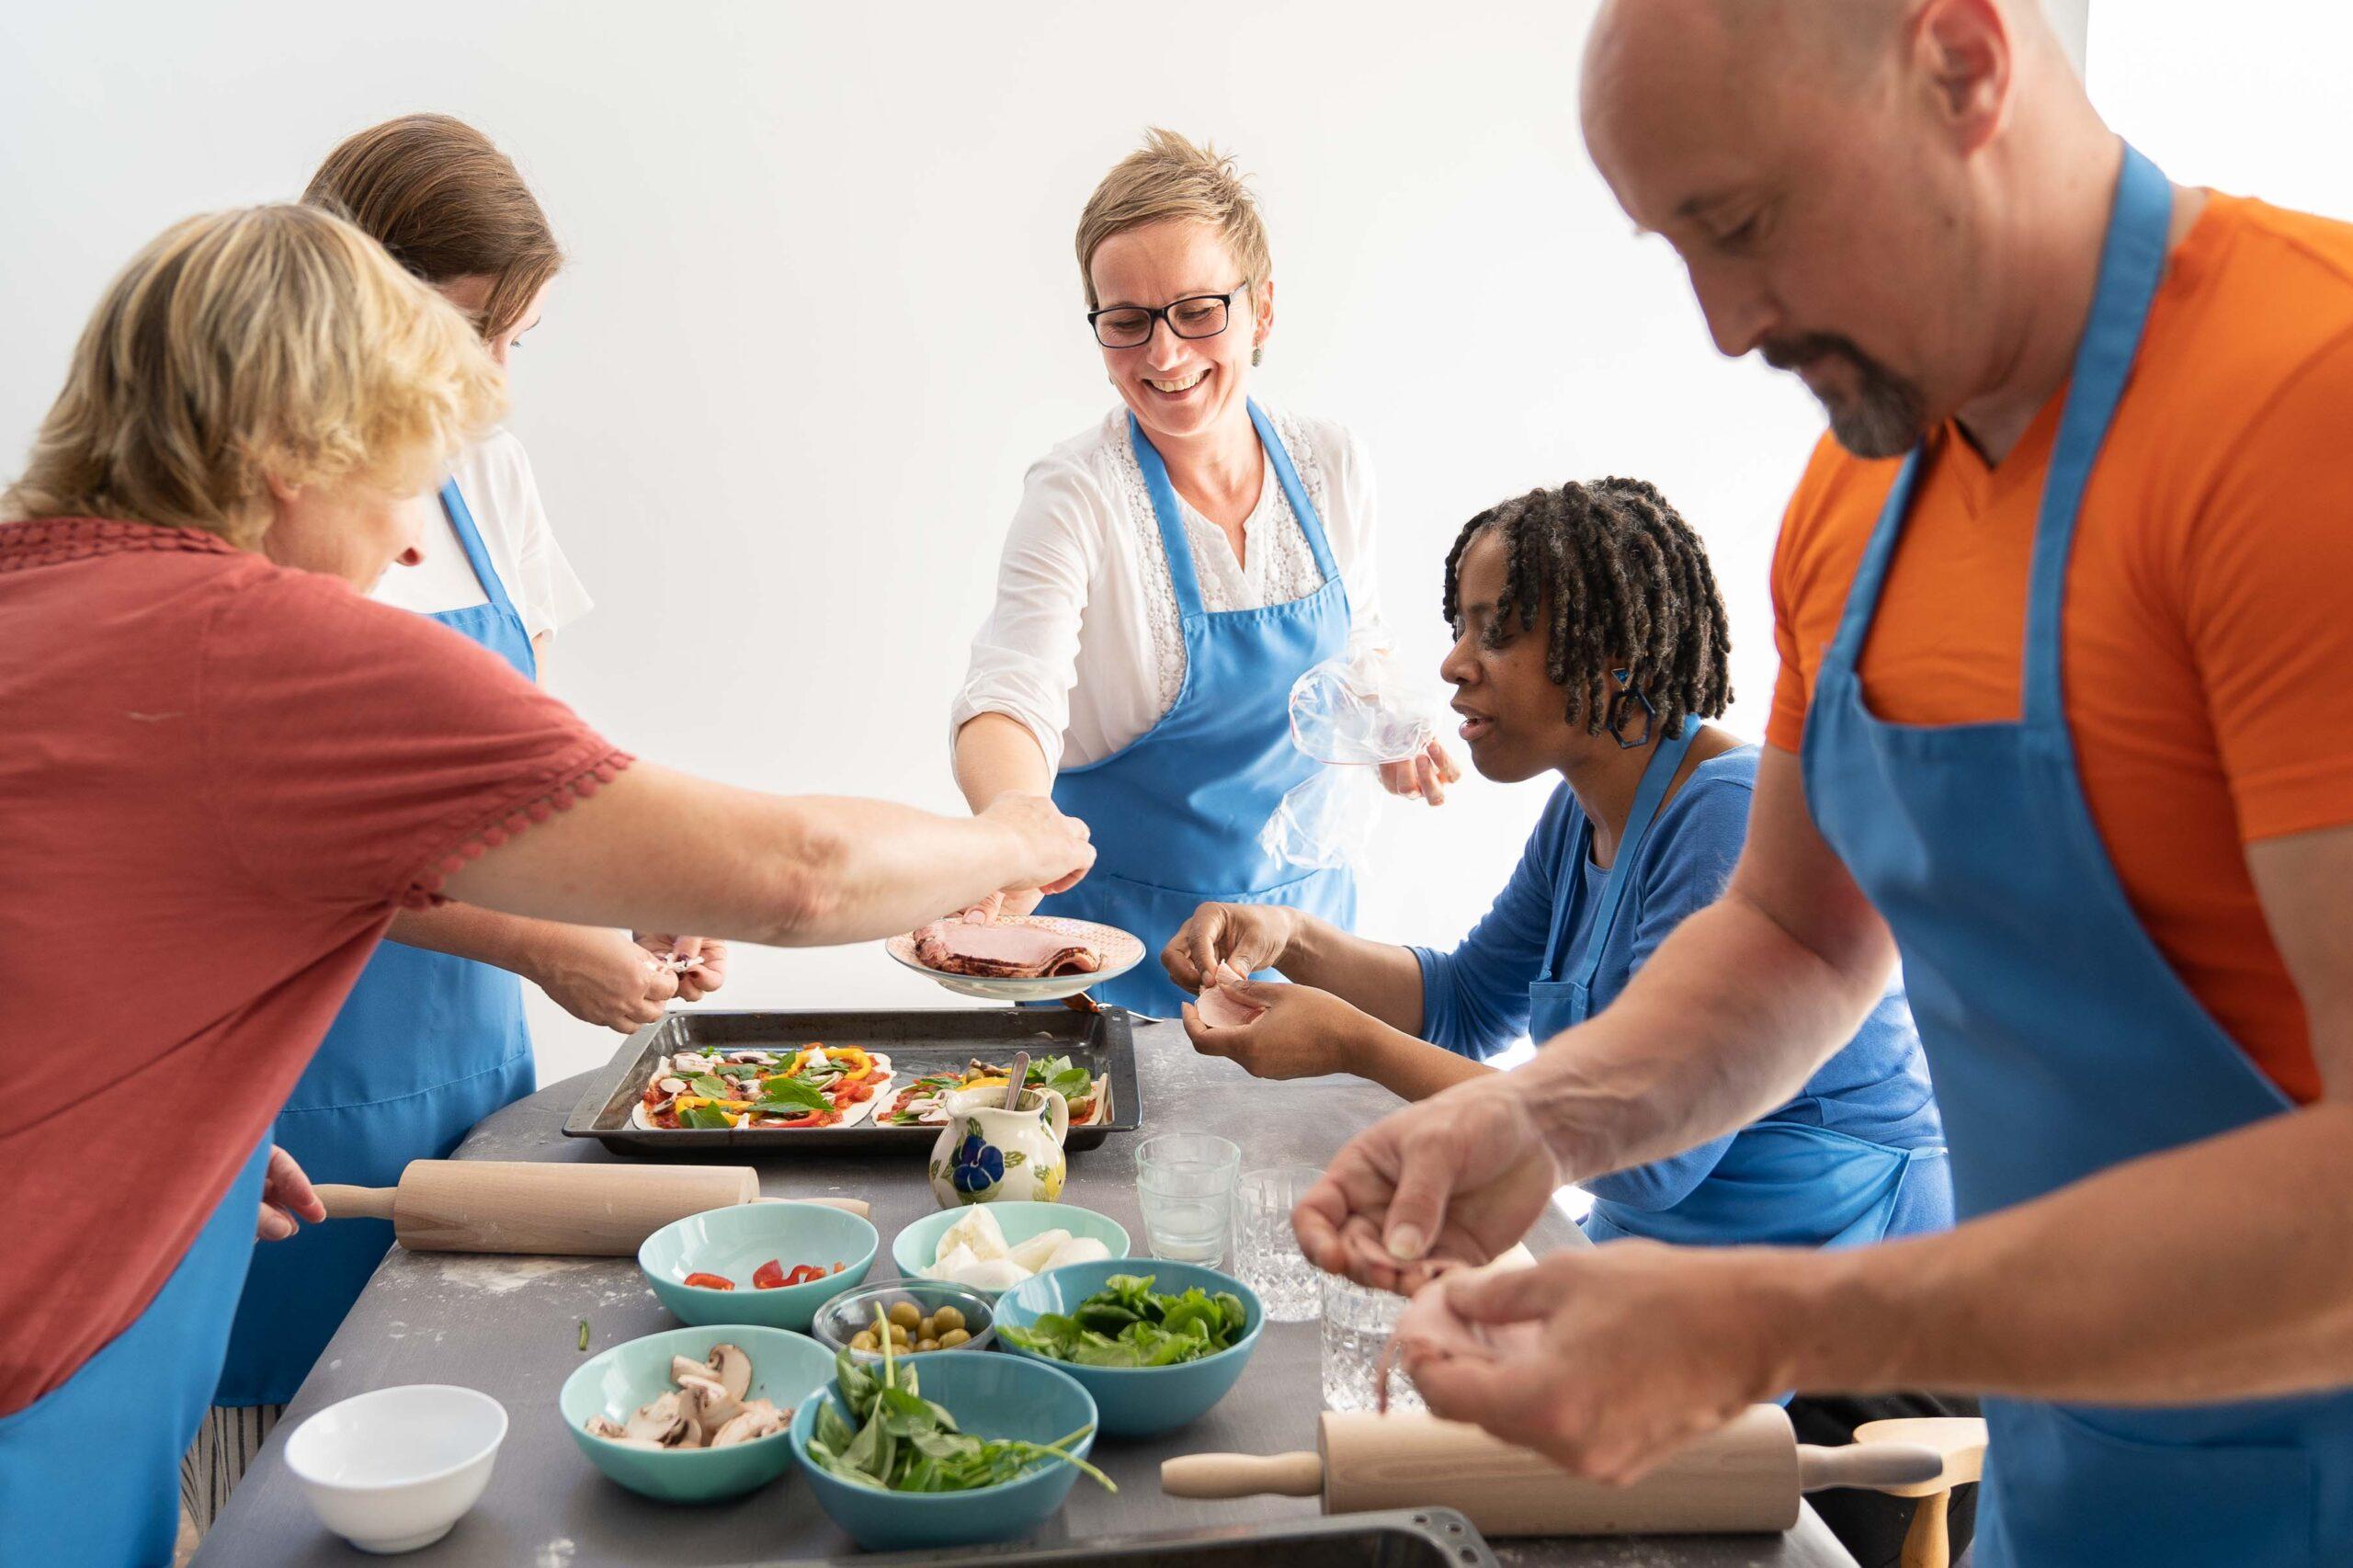 west hampstead baking classes